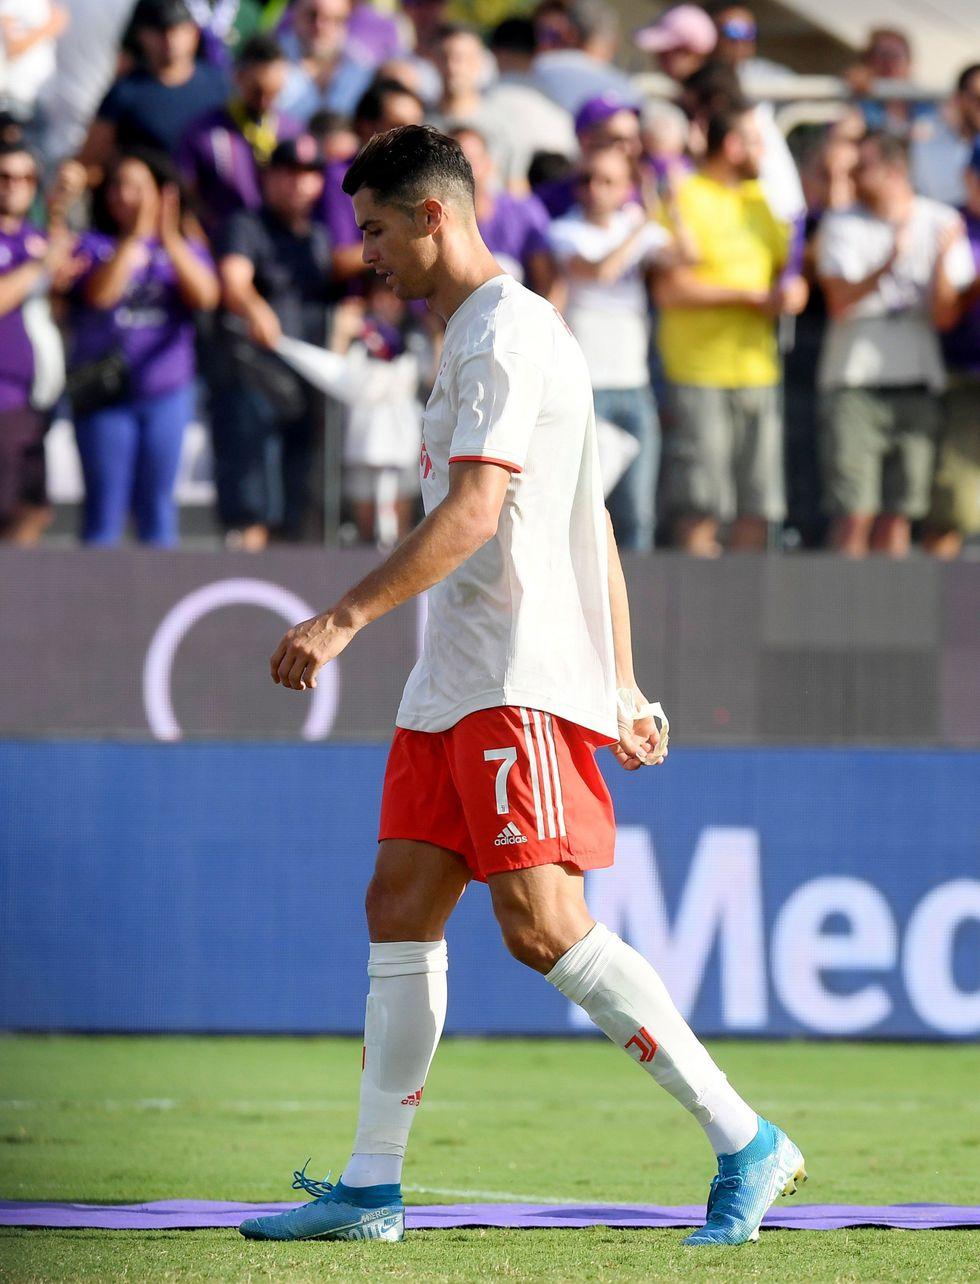 Juventus empató 0-0 ante Fiorentina con Cristiano Ronaldo por la tercera fecha de la Serie A   VIDEO. (Foto: AFP)